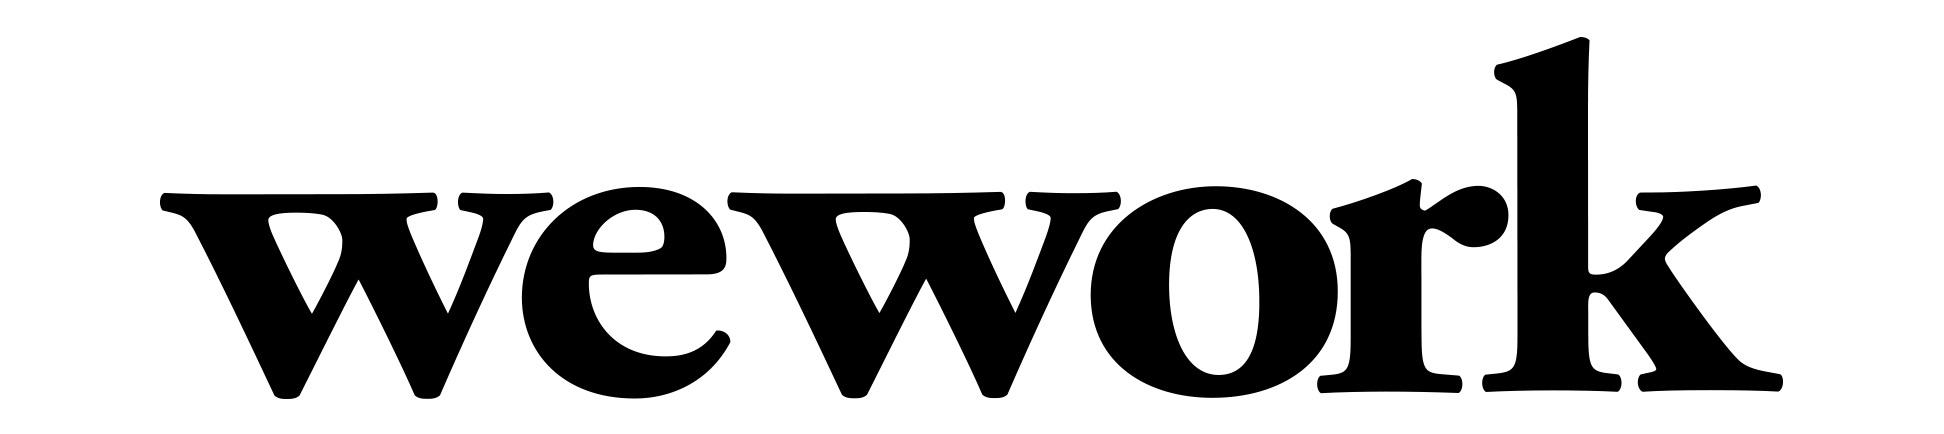 #007 | WeWork